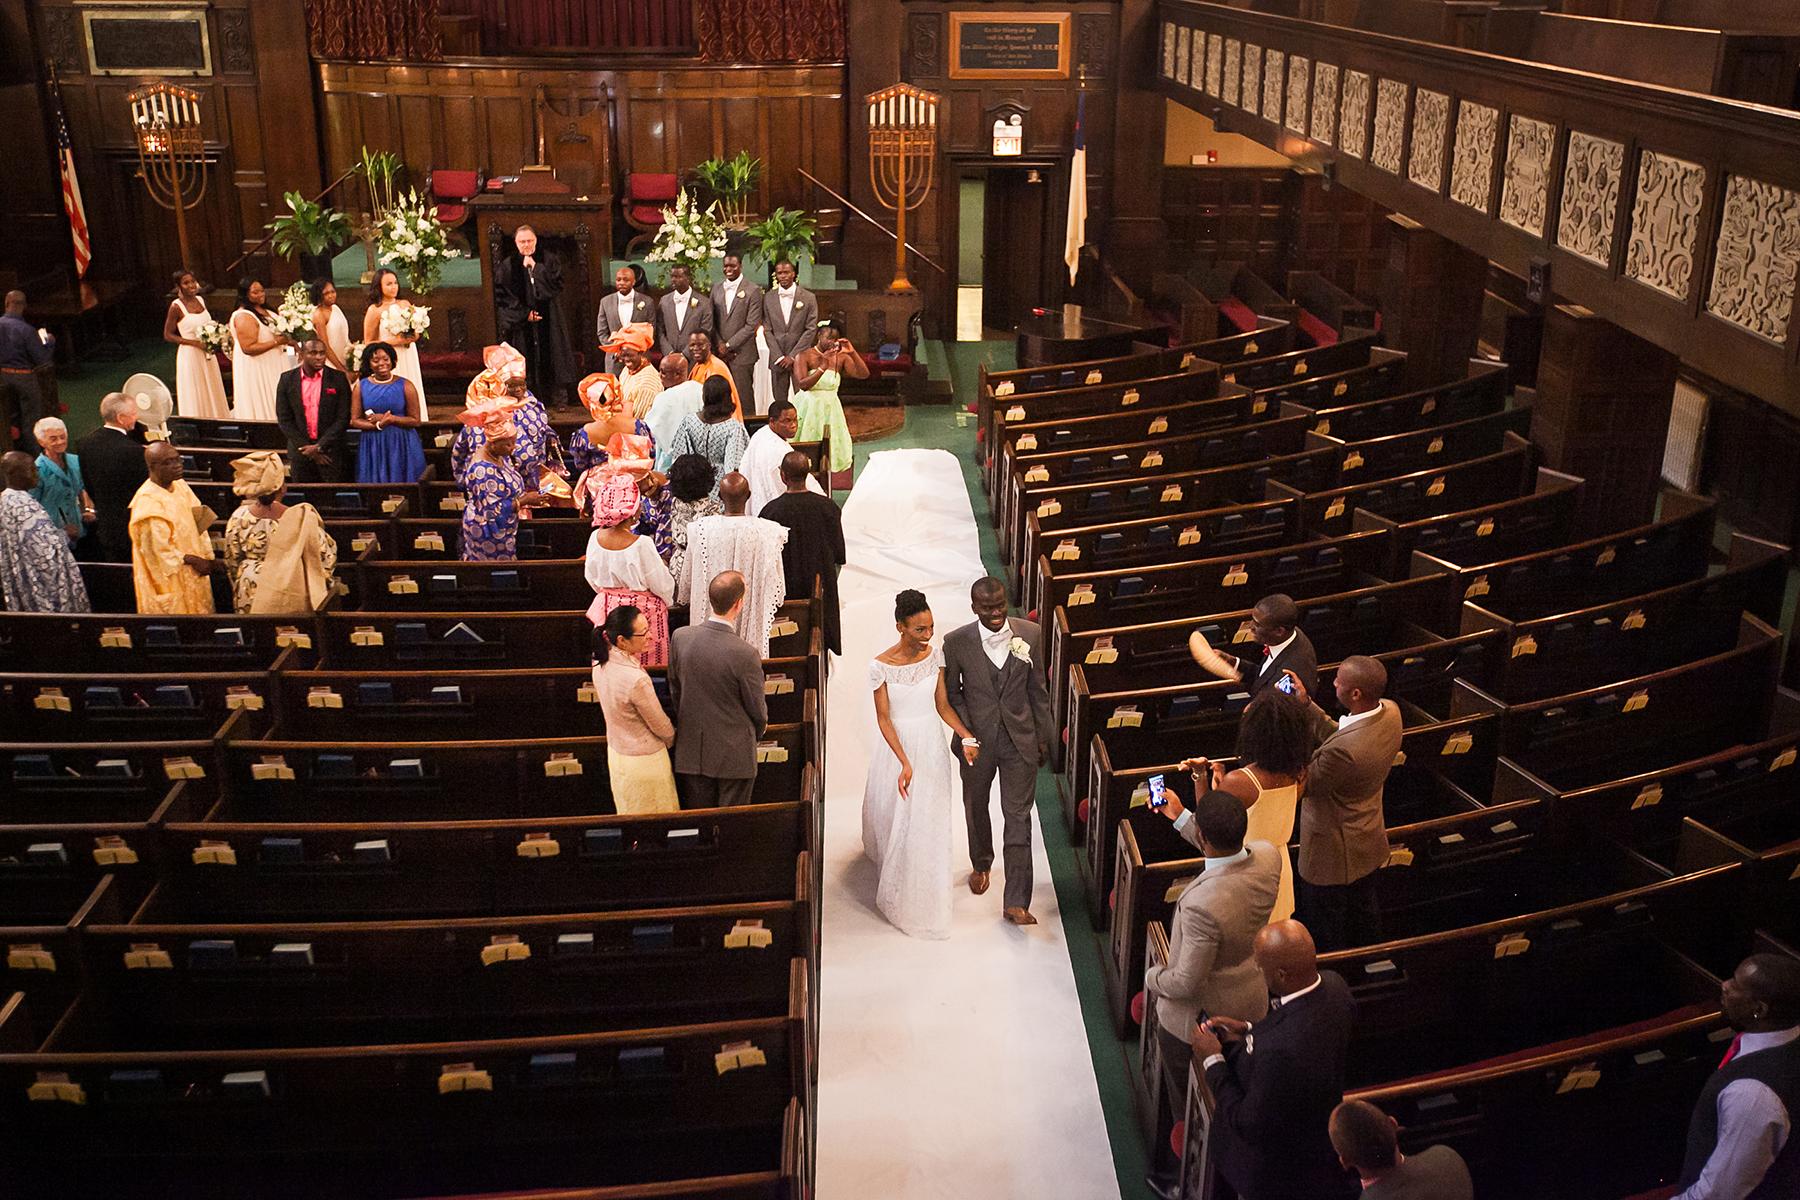 nigerian-american-vintage-wedding-at-newberry-library.jpg